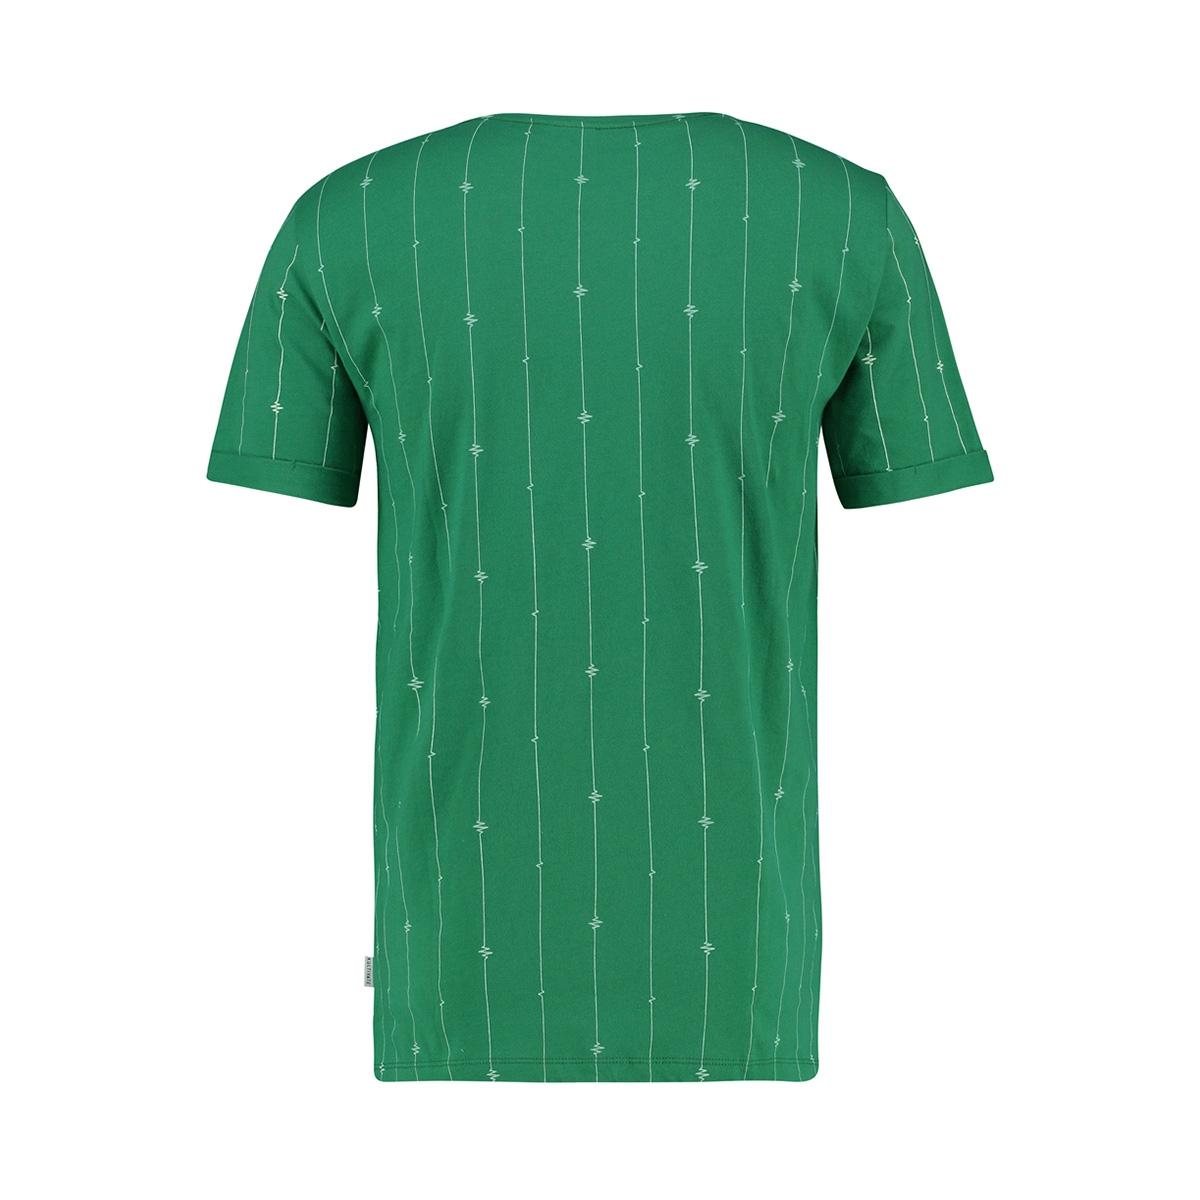 ts heartbeat 1901030207 kultivate t-shirt 422 pine green